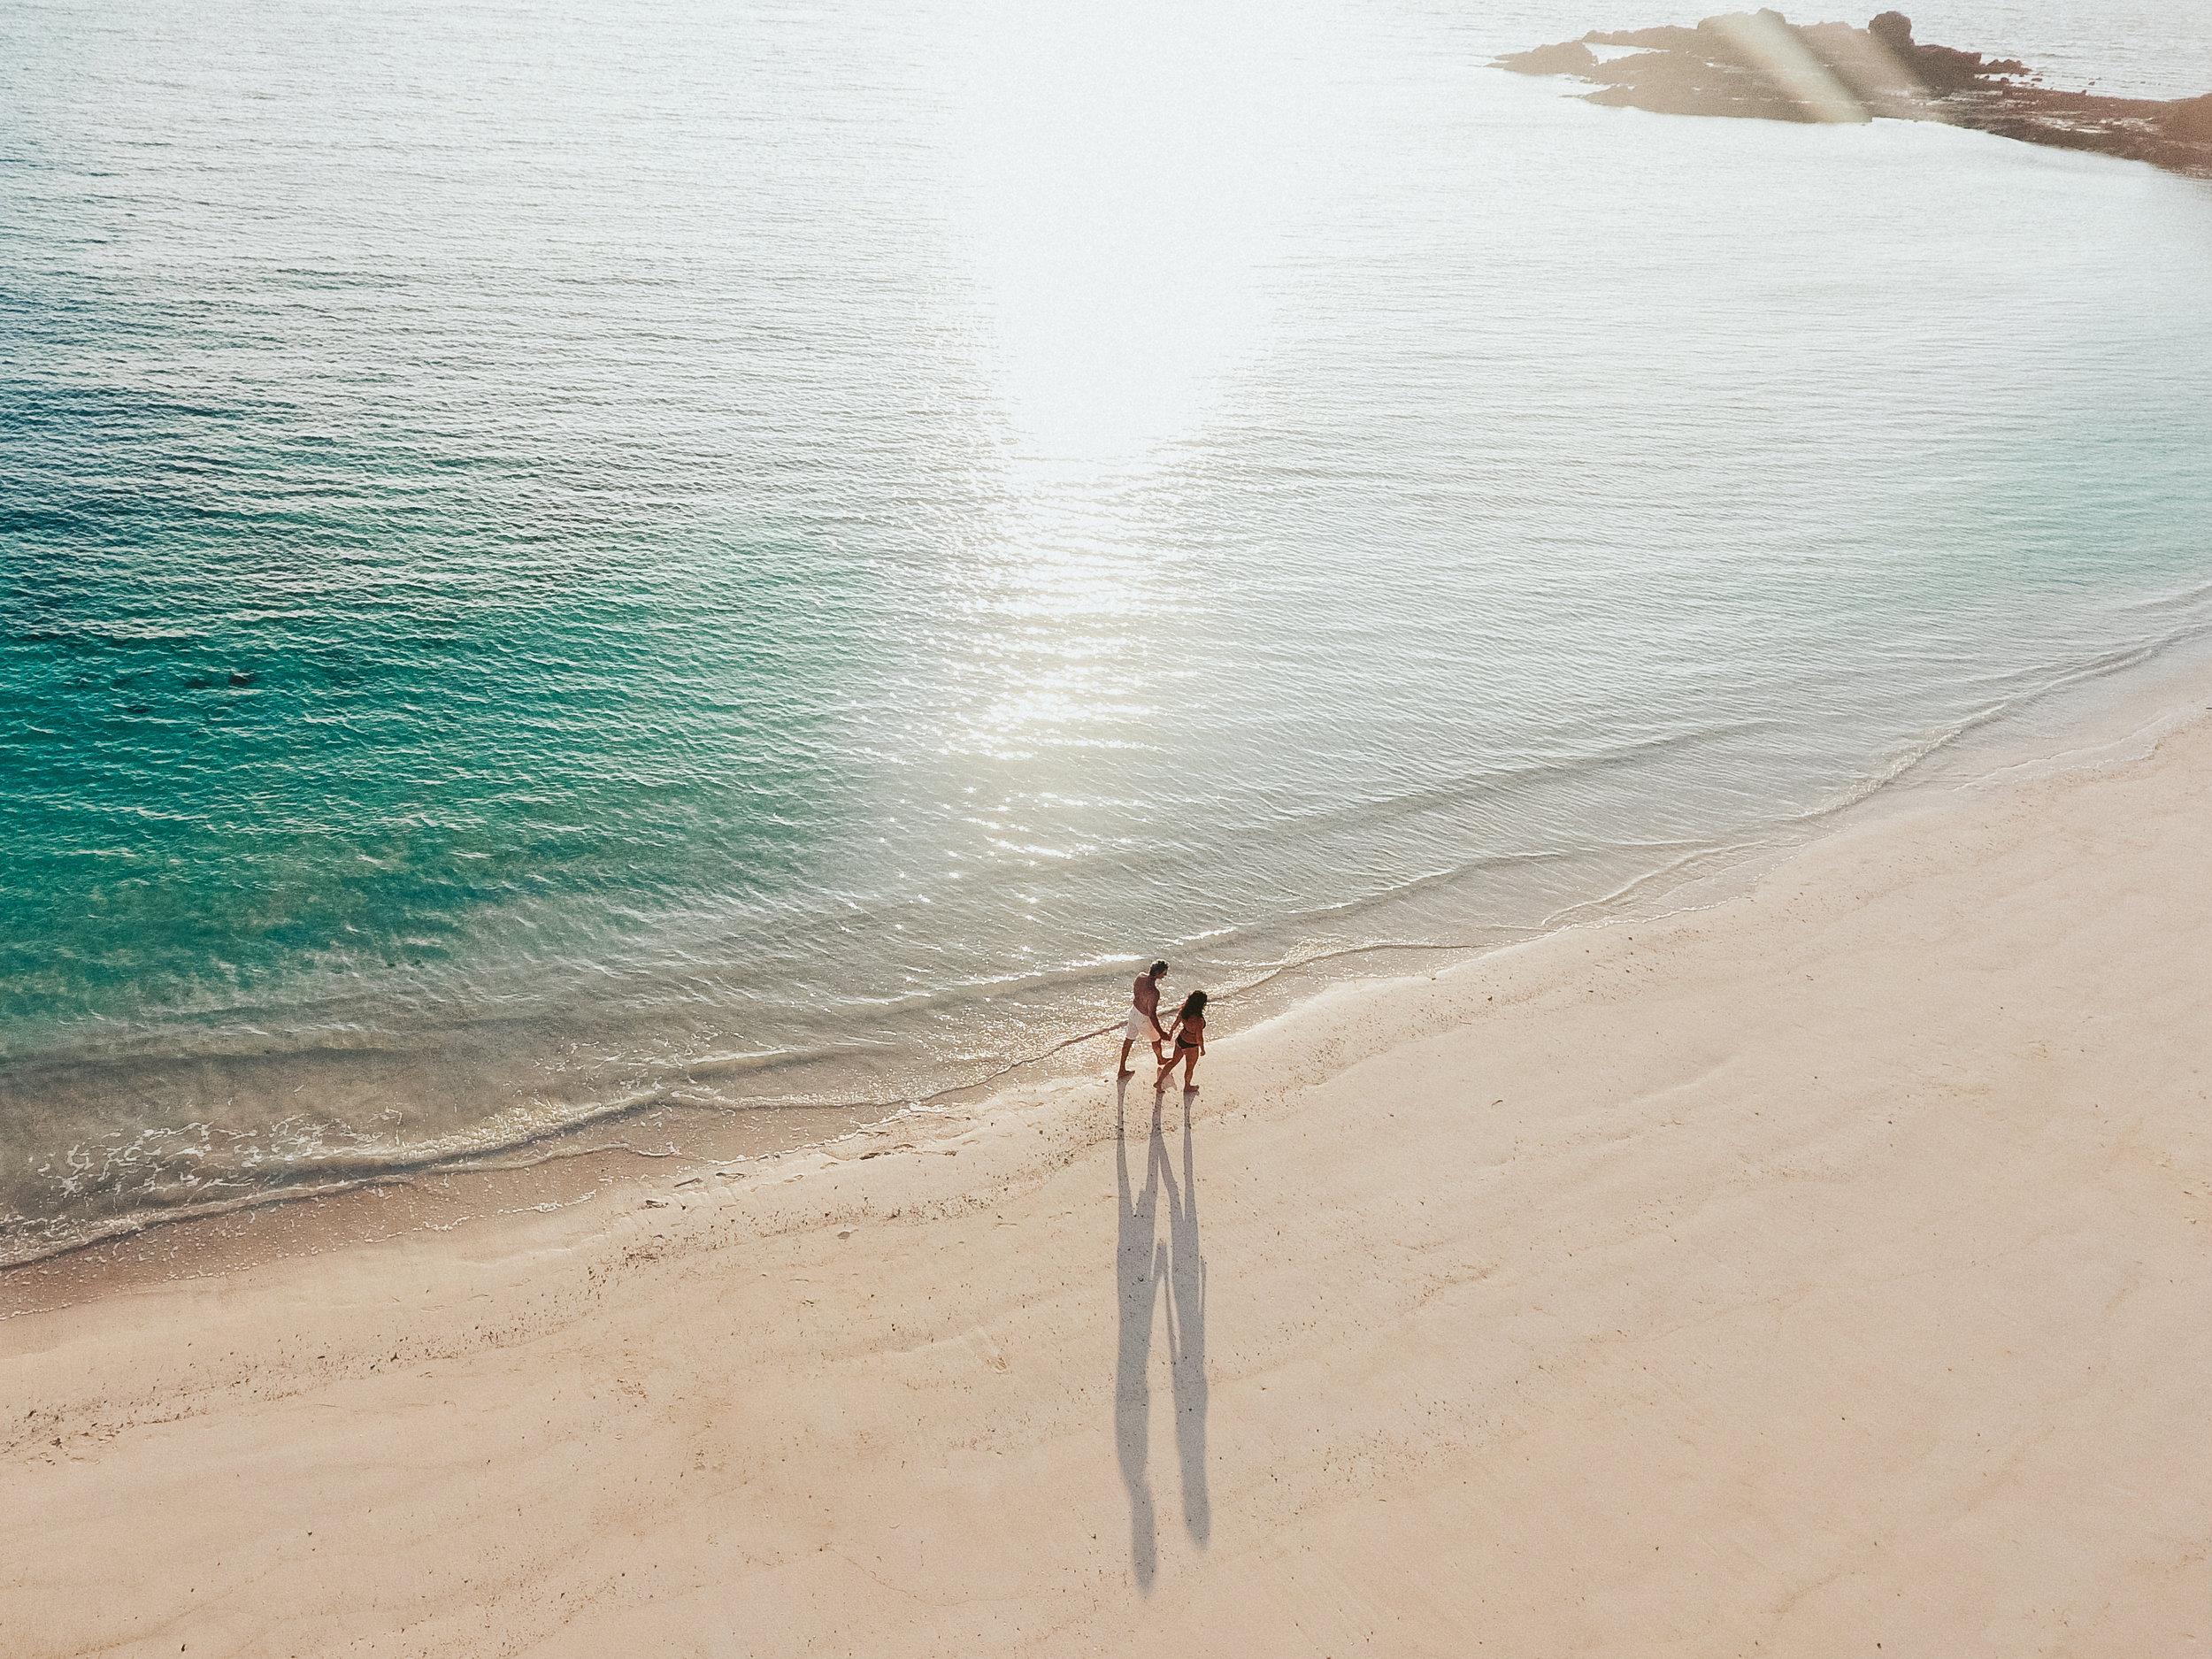 TurtleIsland-private beaches-kamacatchme-fijiphotography-607.jpg